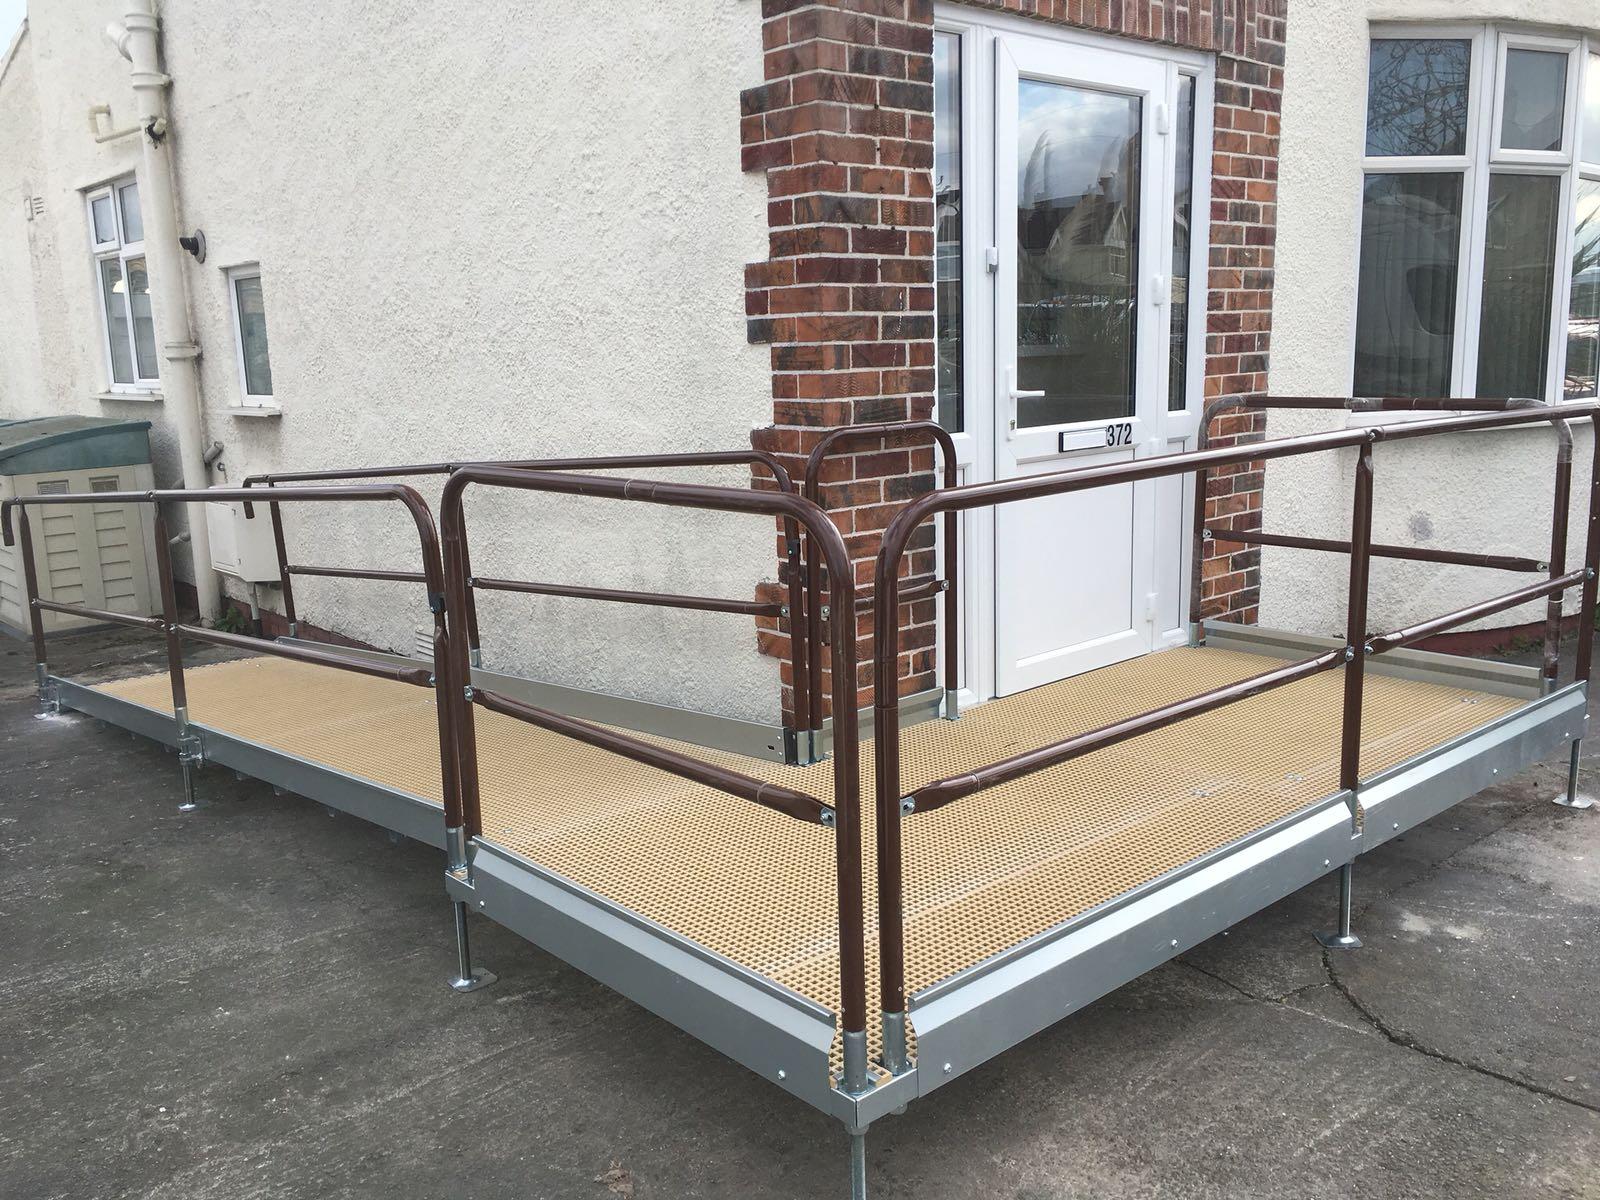 Disabled ramp Wrapped around corner